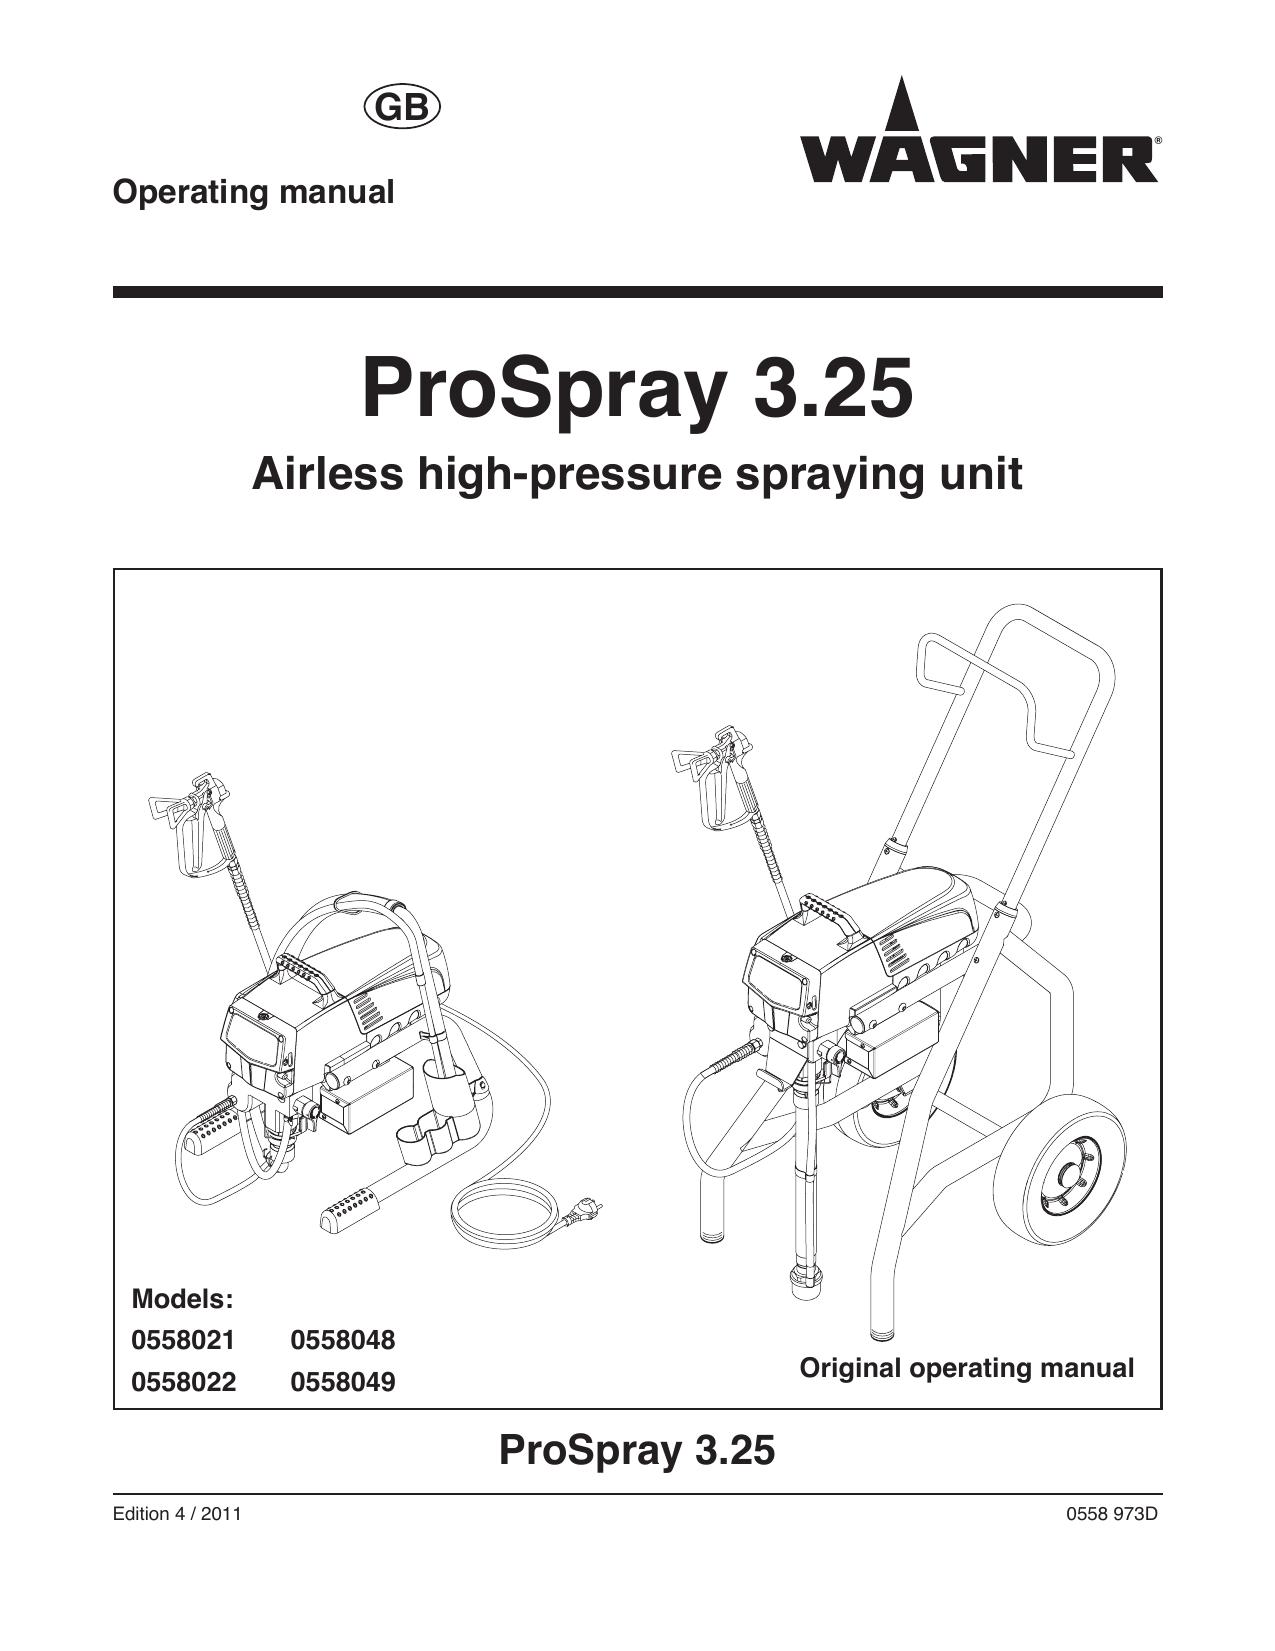 WAGNER ProSpray 3.25 Operating instructions   manualzz.com on